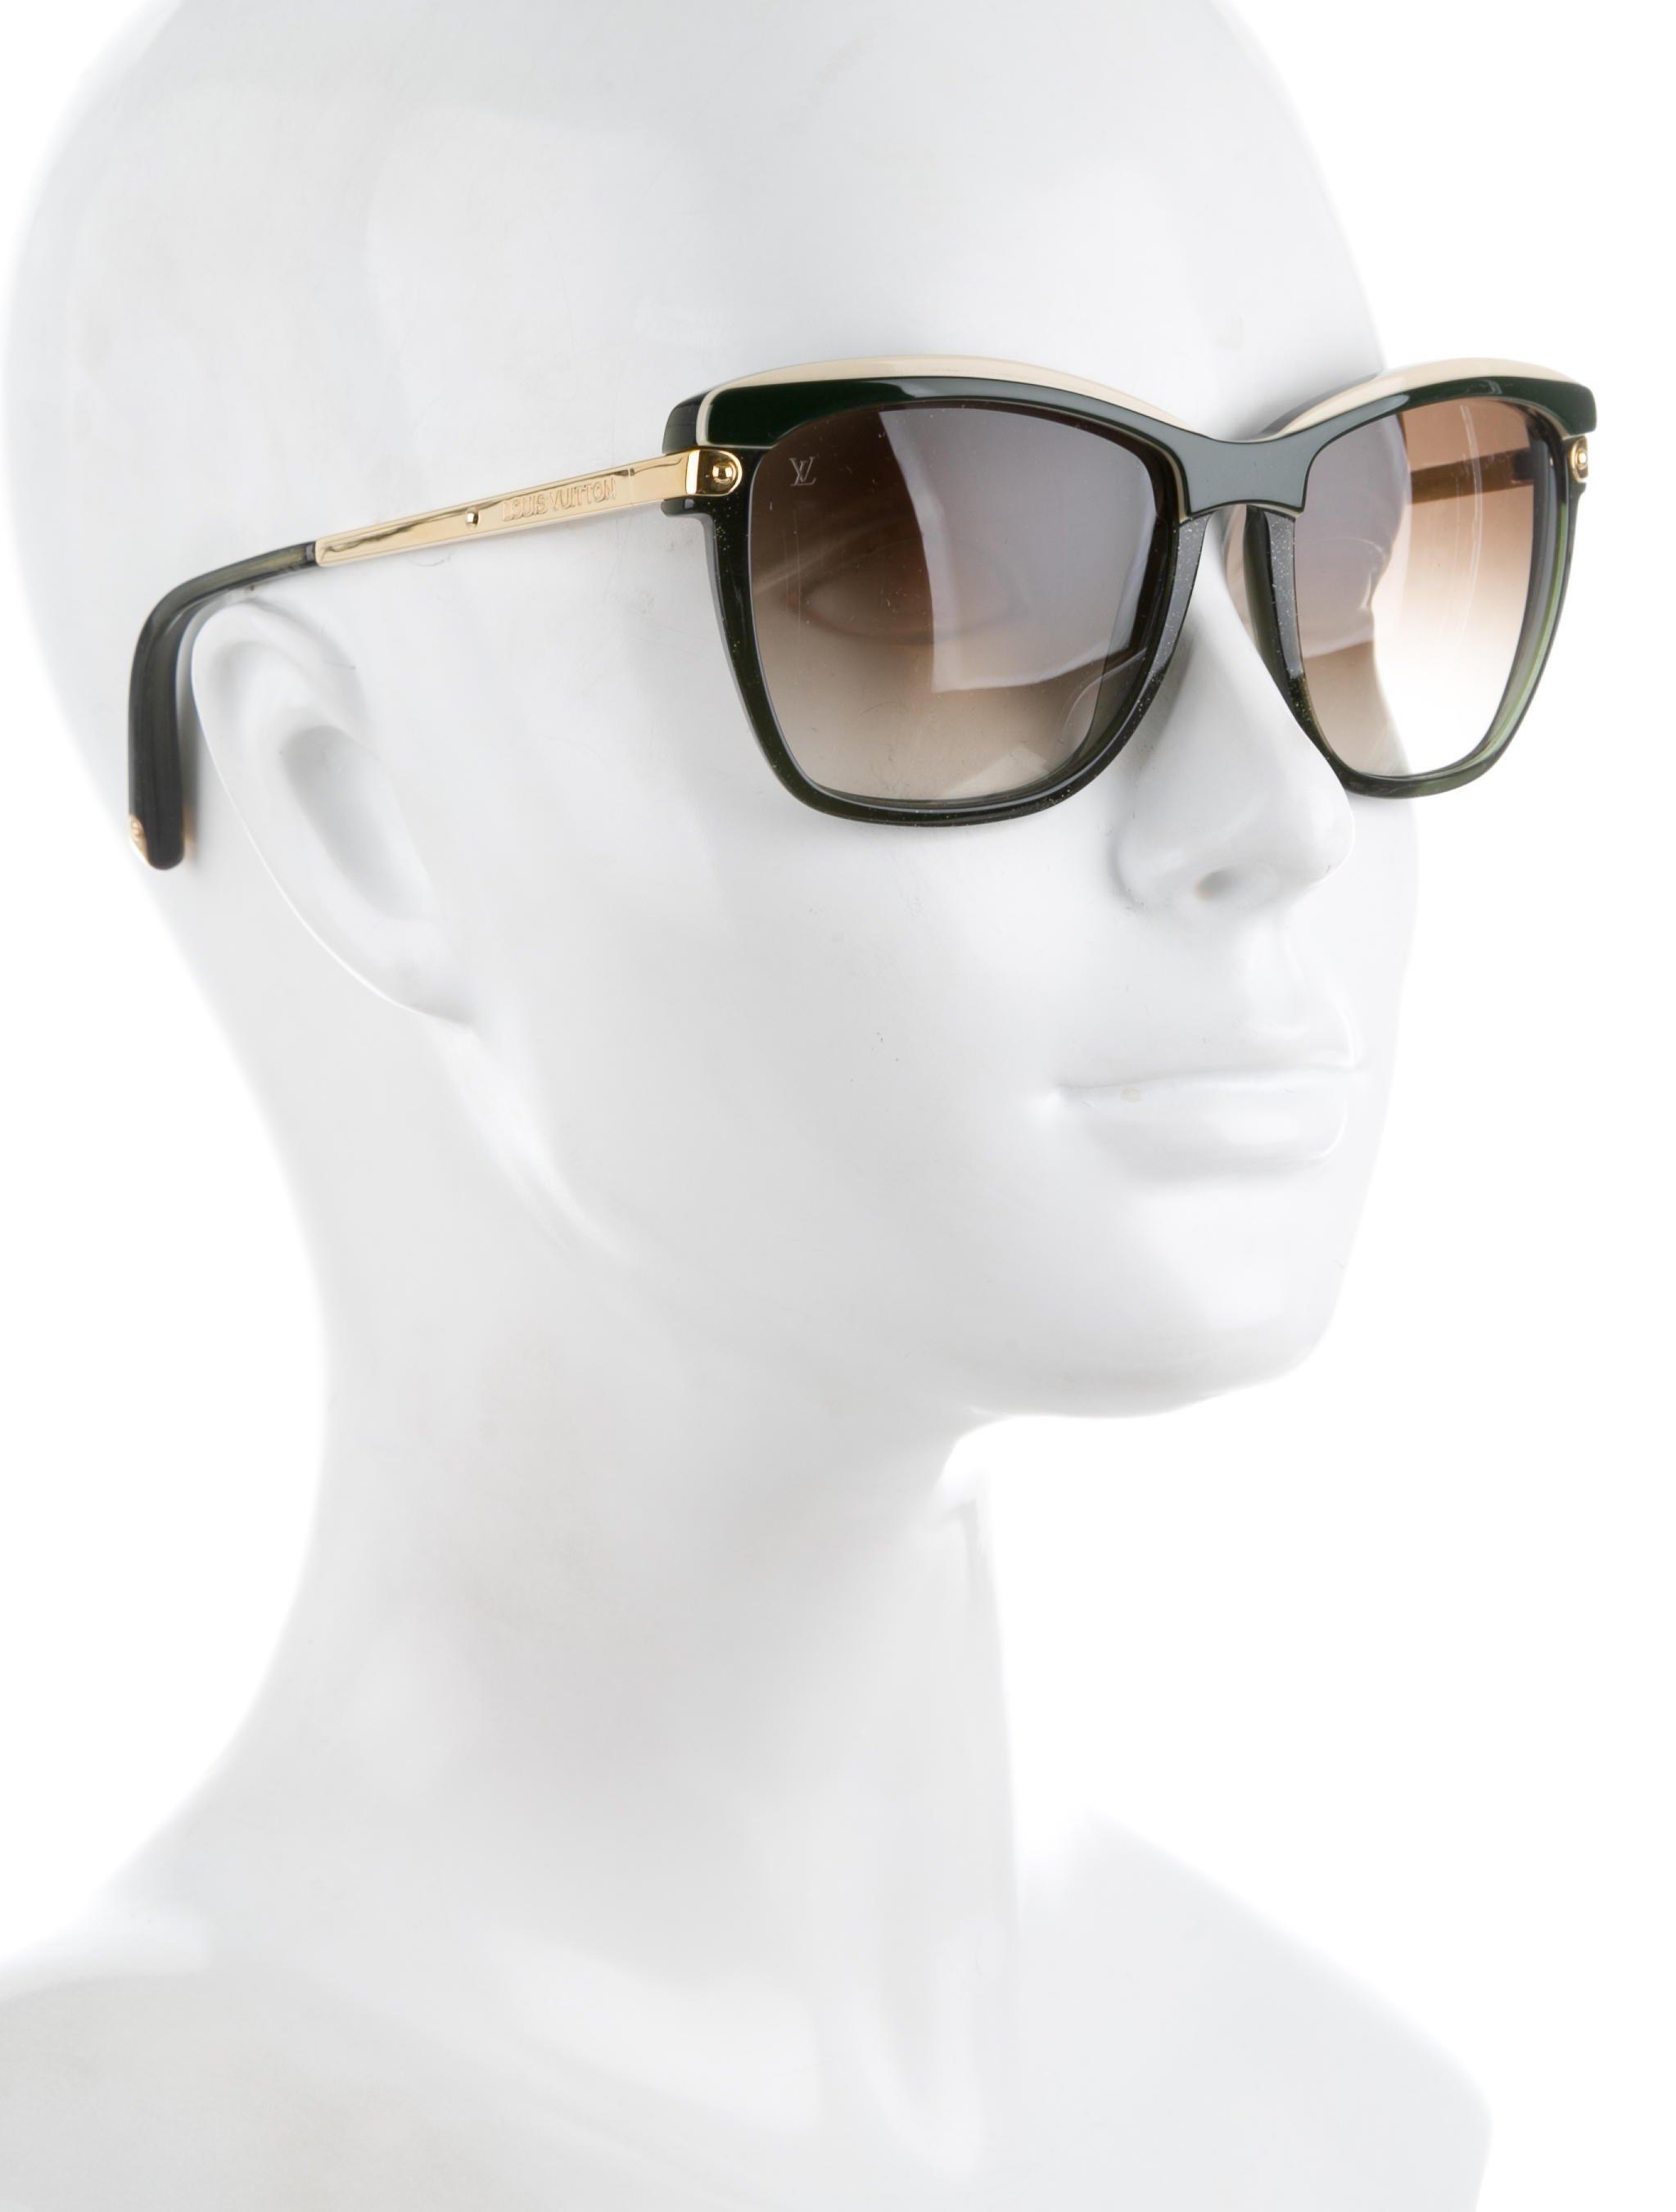 49f4407c668c Lyst - Louis Vuitton Ambrosia Logo Sunglasses Olive in Green